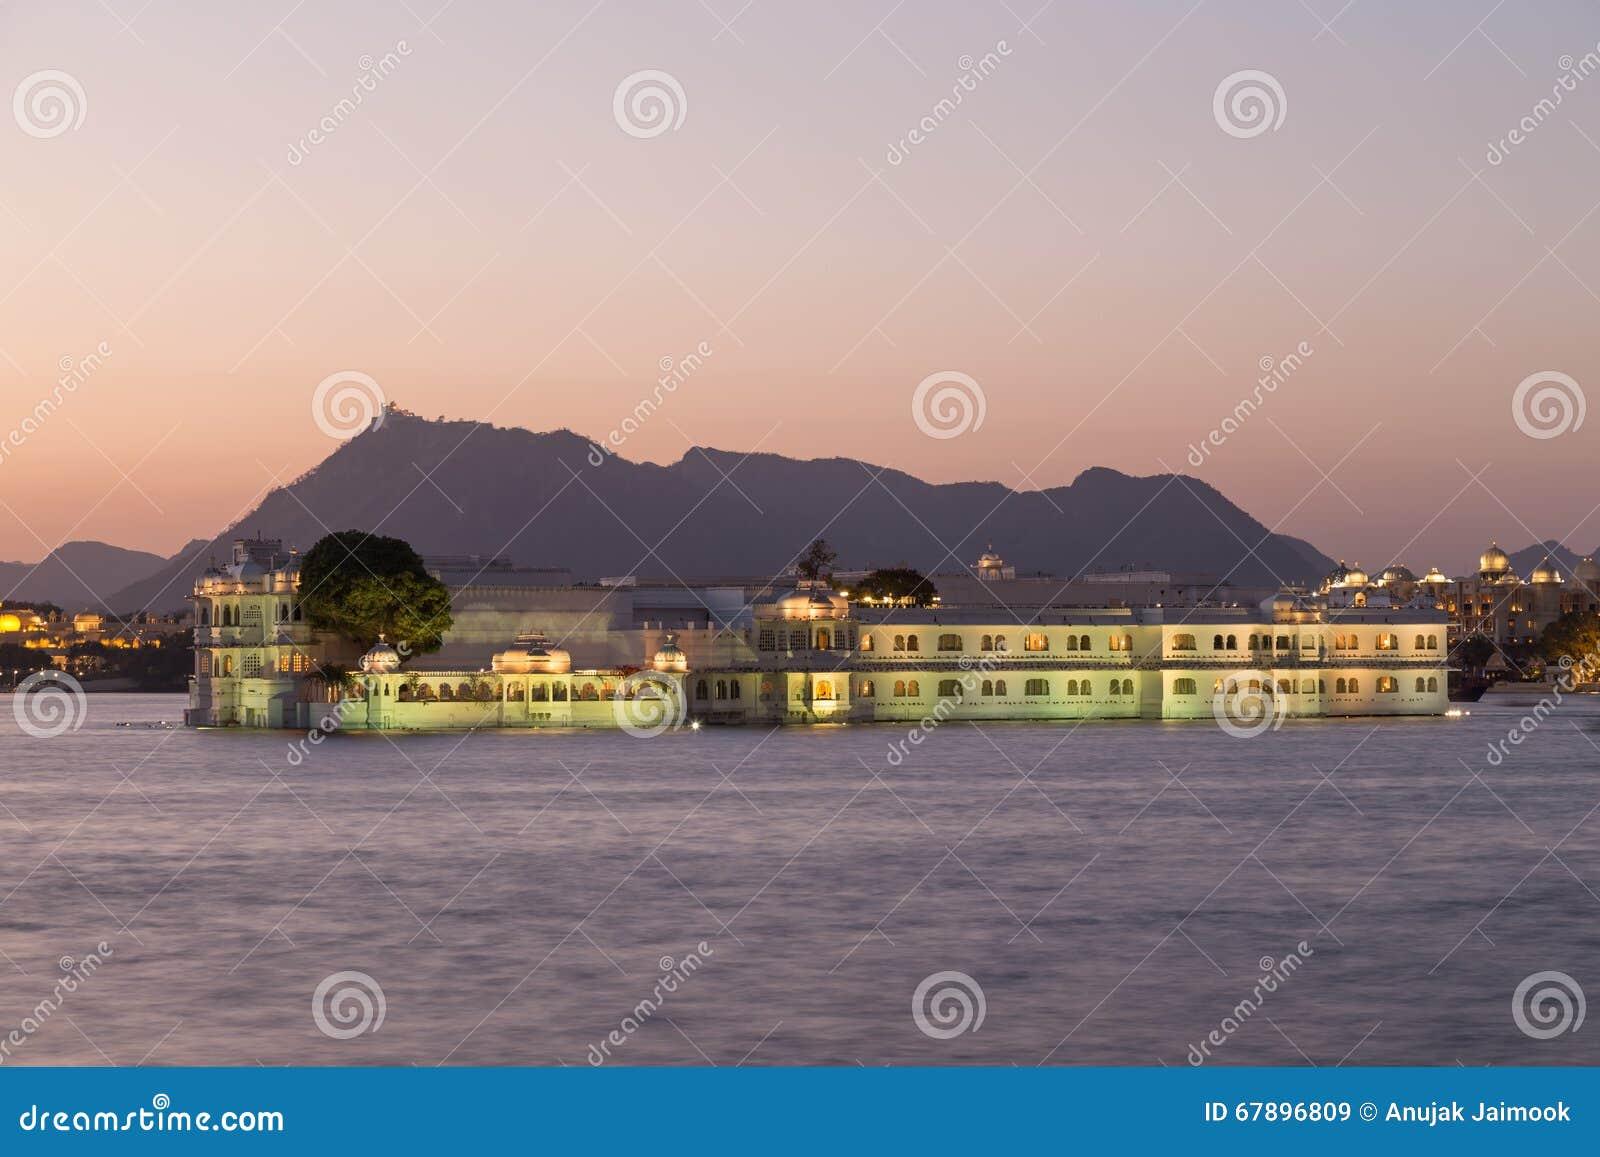 Taj乌代浦市的,印度湖宫殿